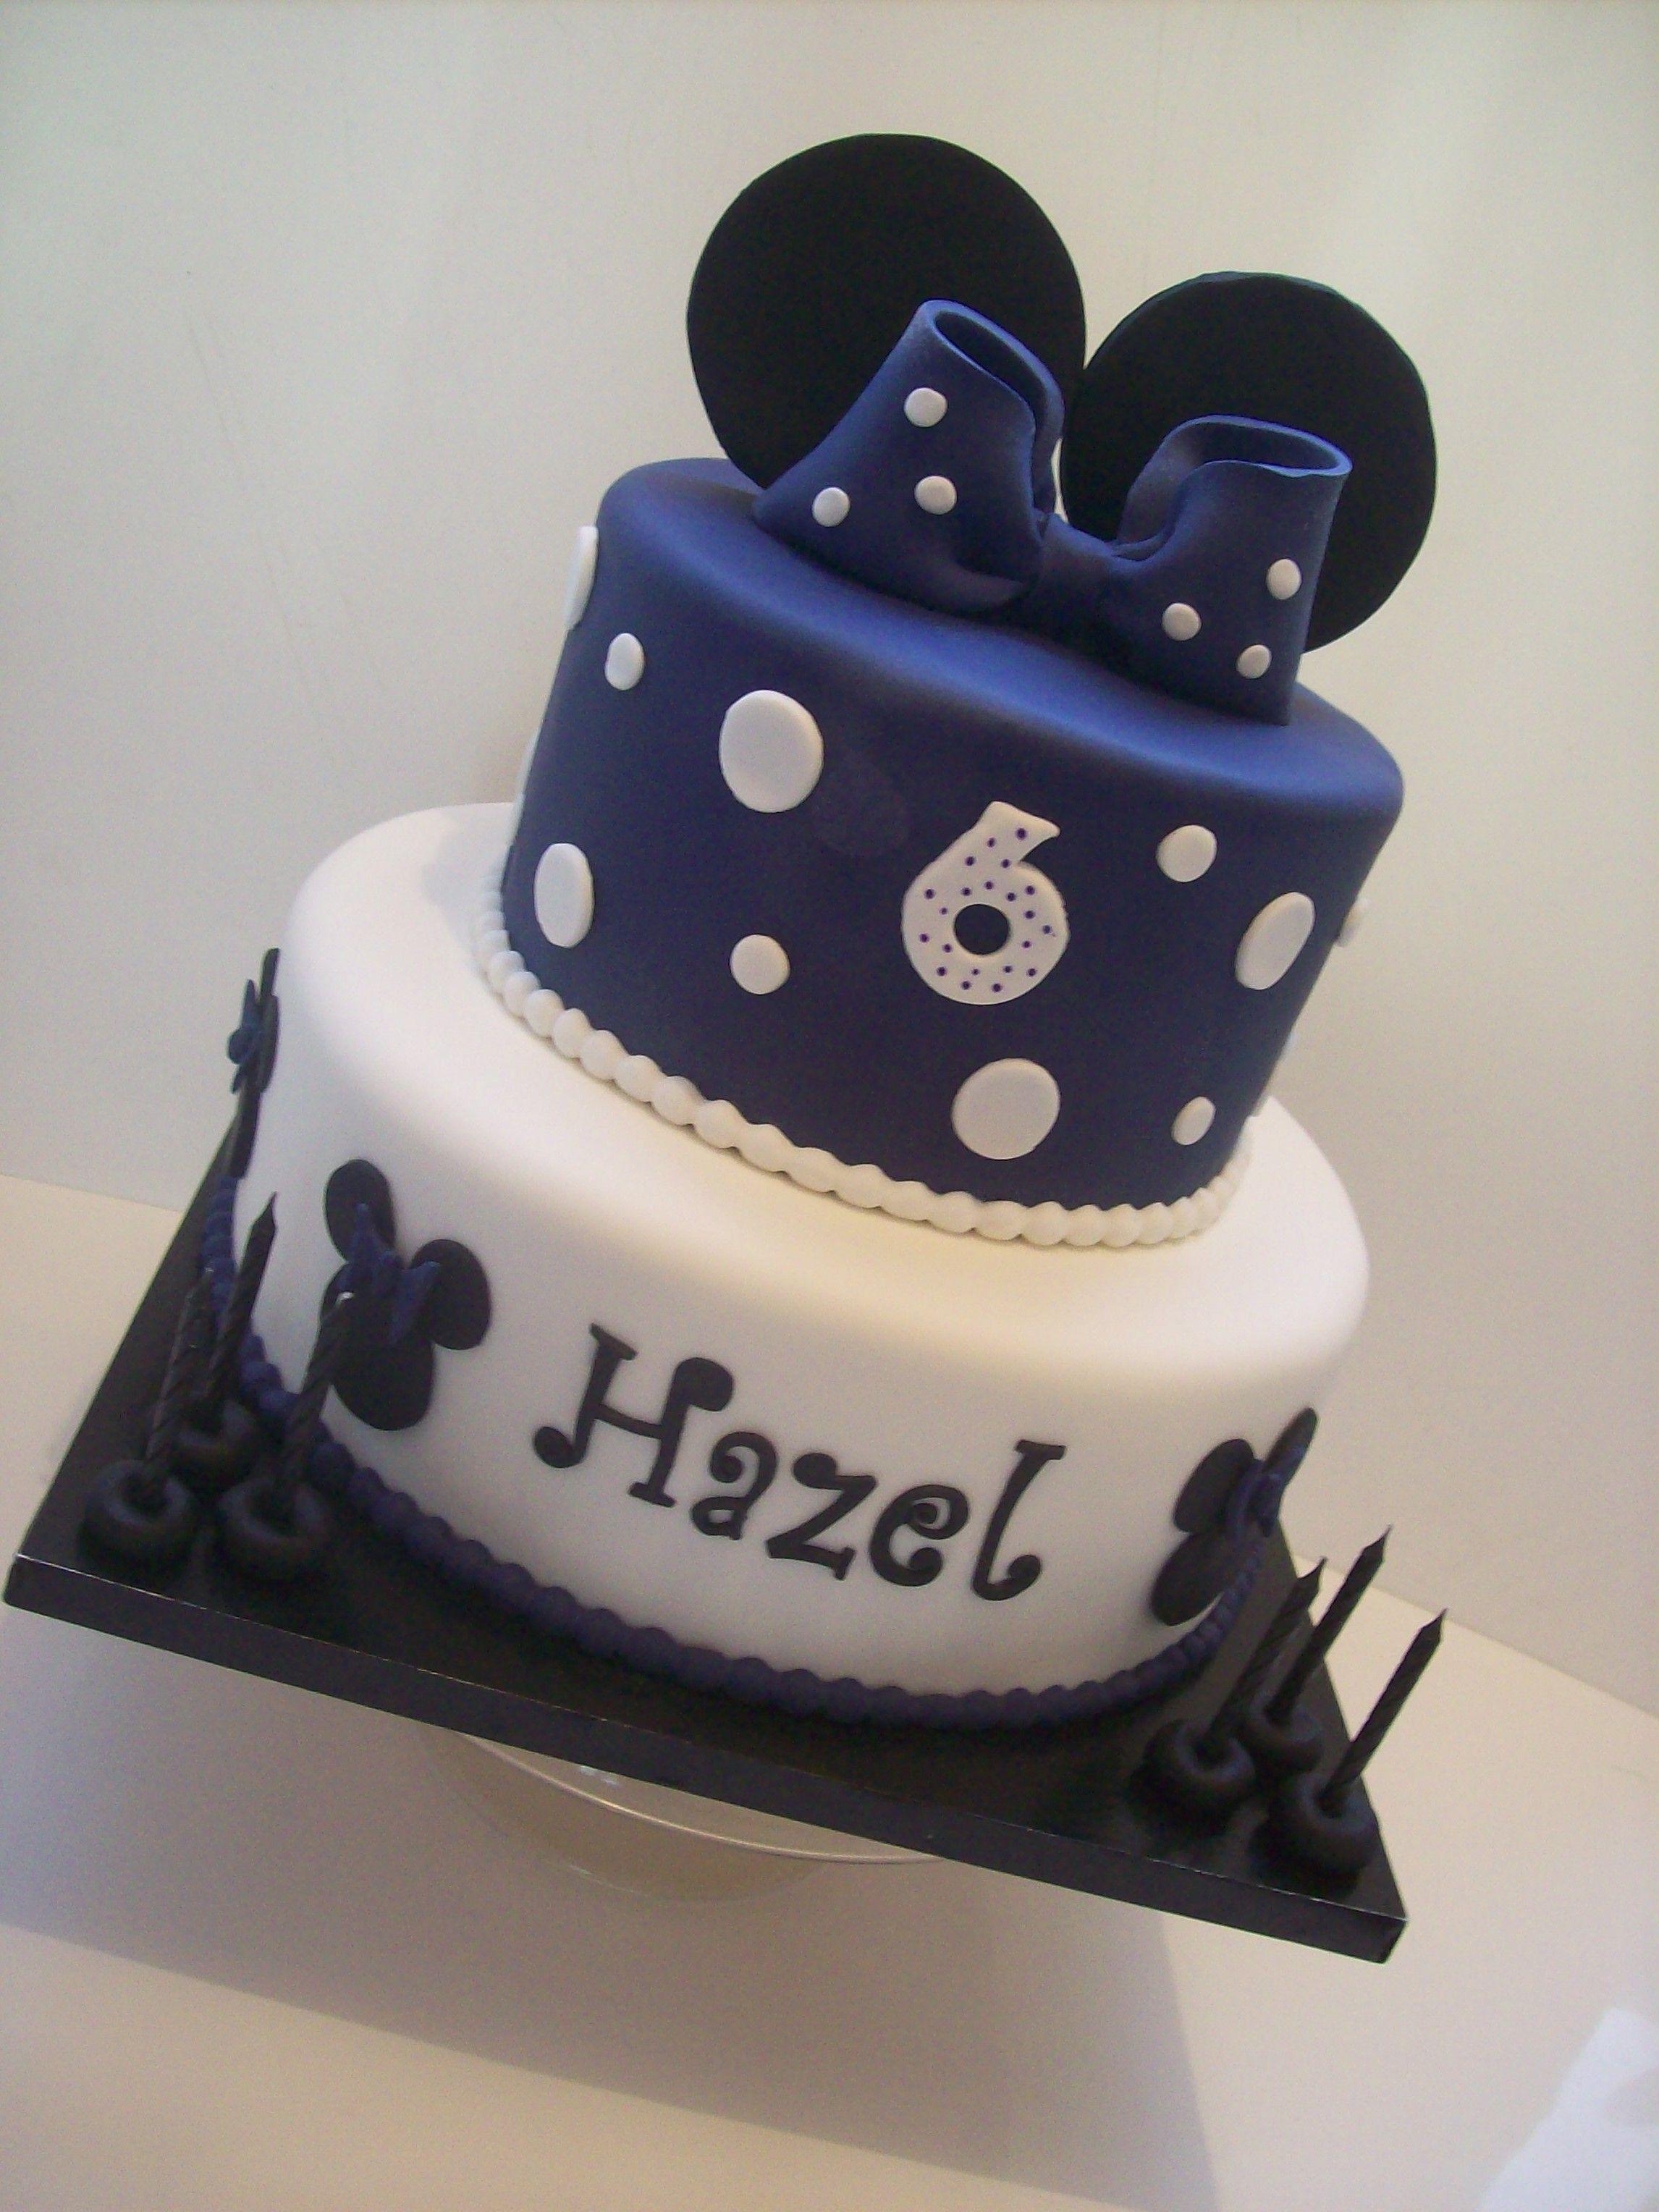 Minnie Mouse Cake Auckland 295 Birthday Cakes Auckland